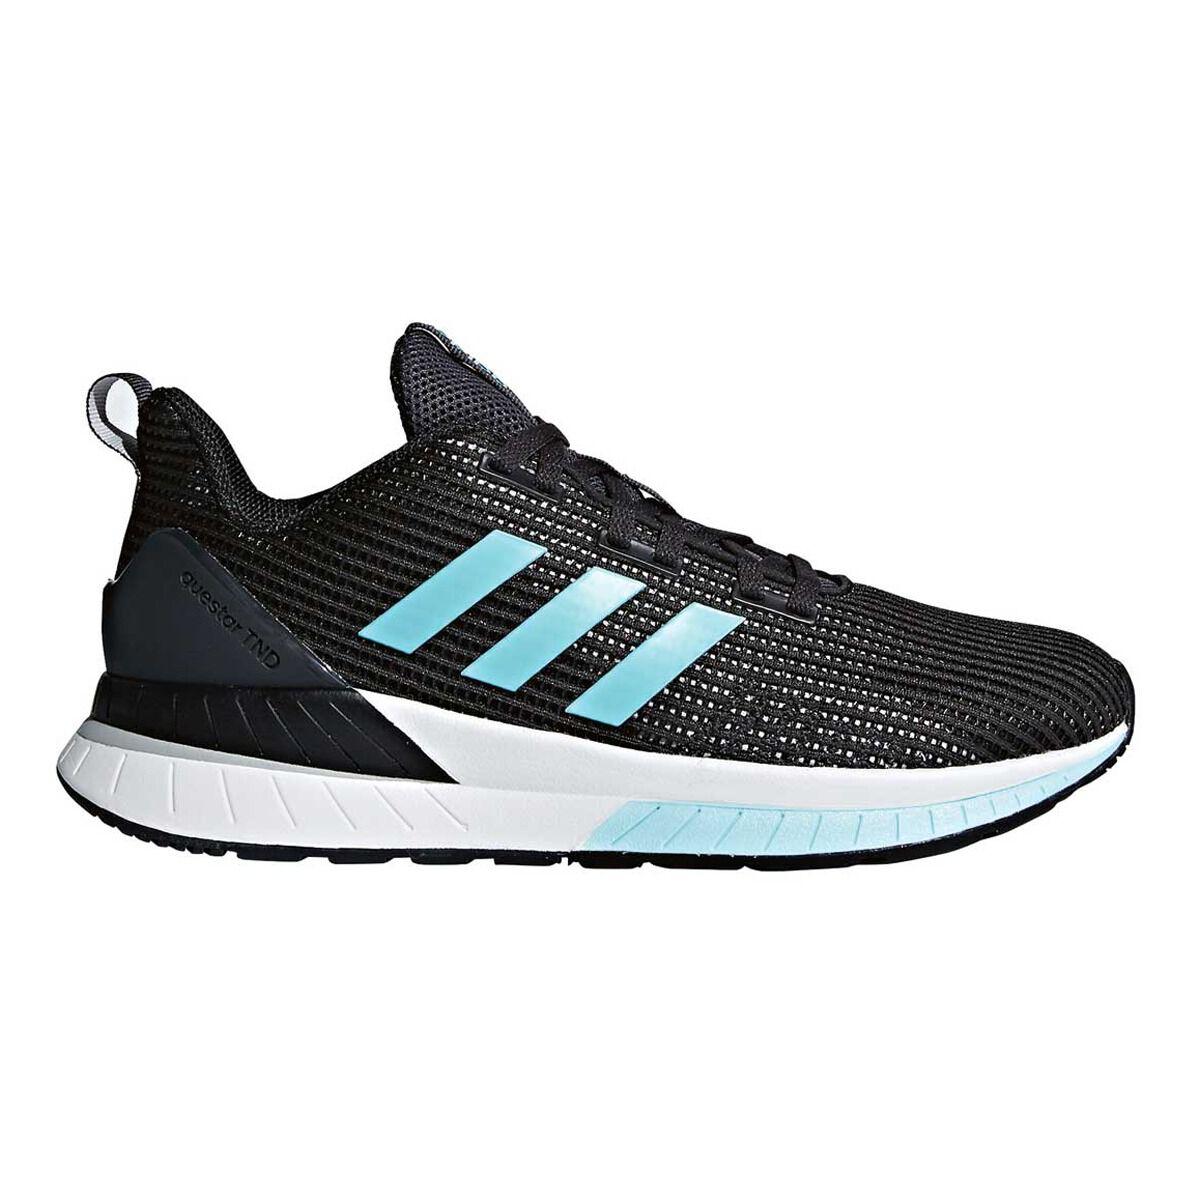 ADIDAS Questar TND Running Shoes